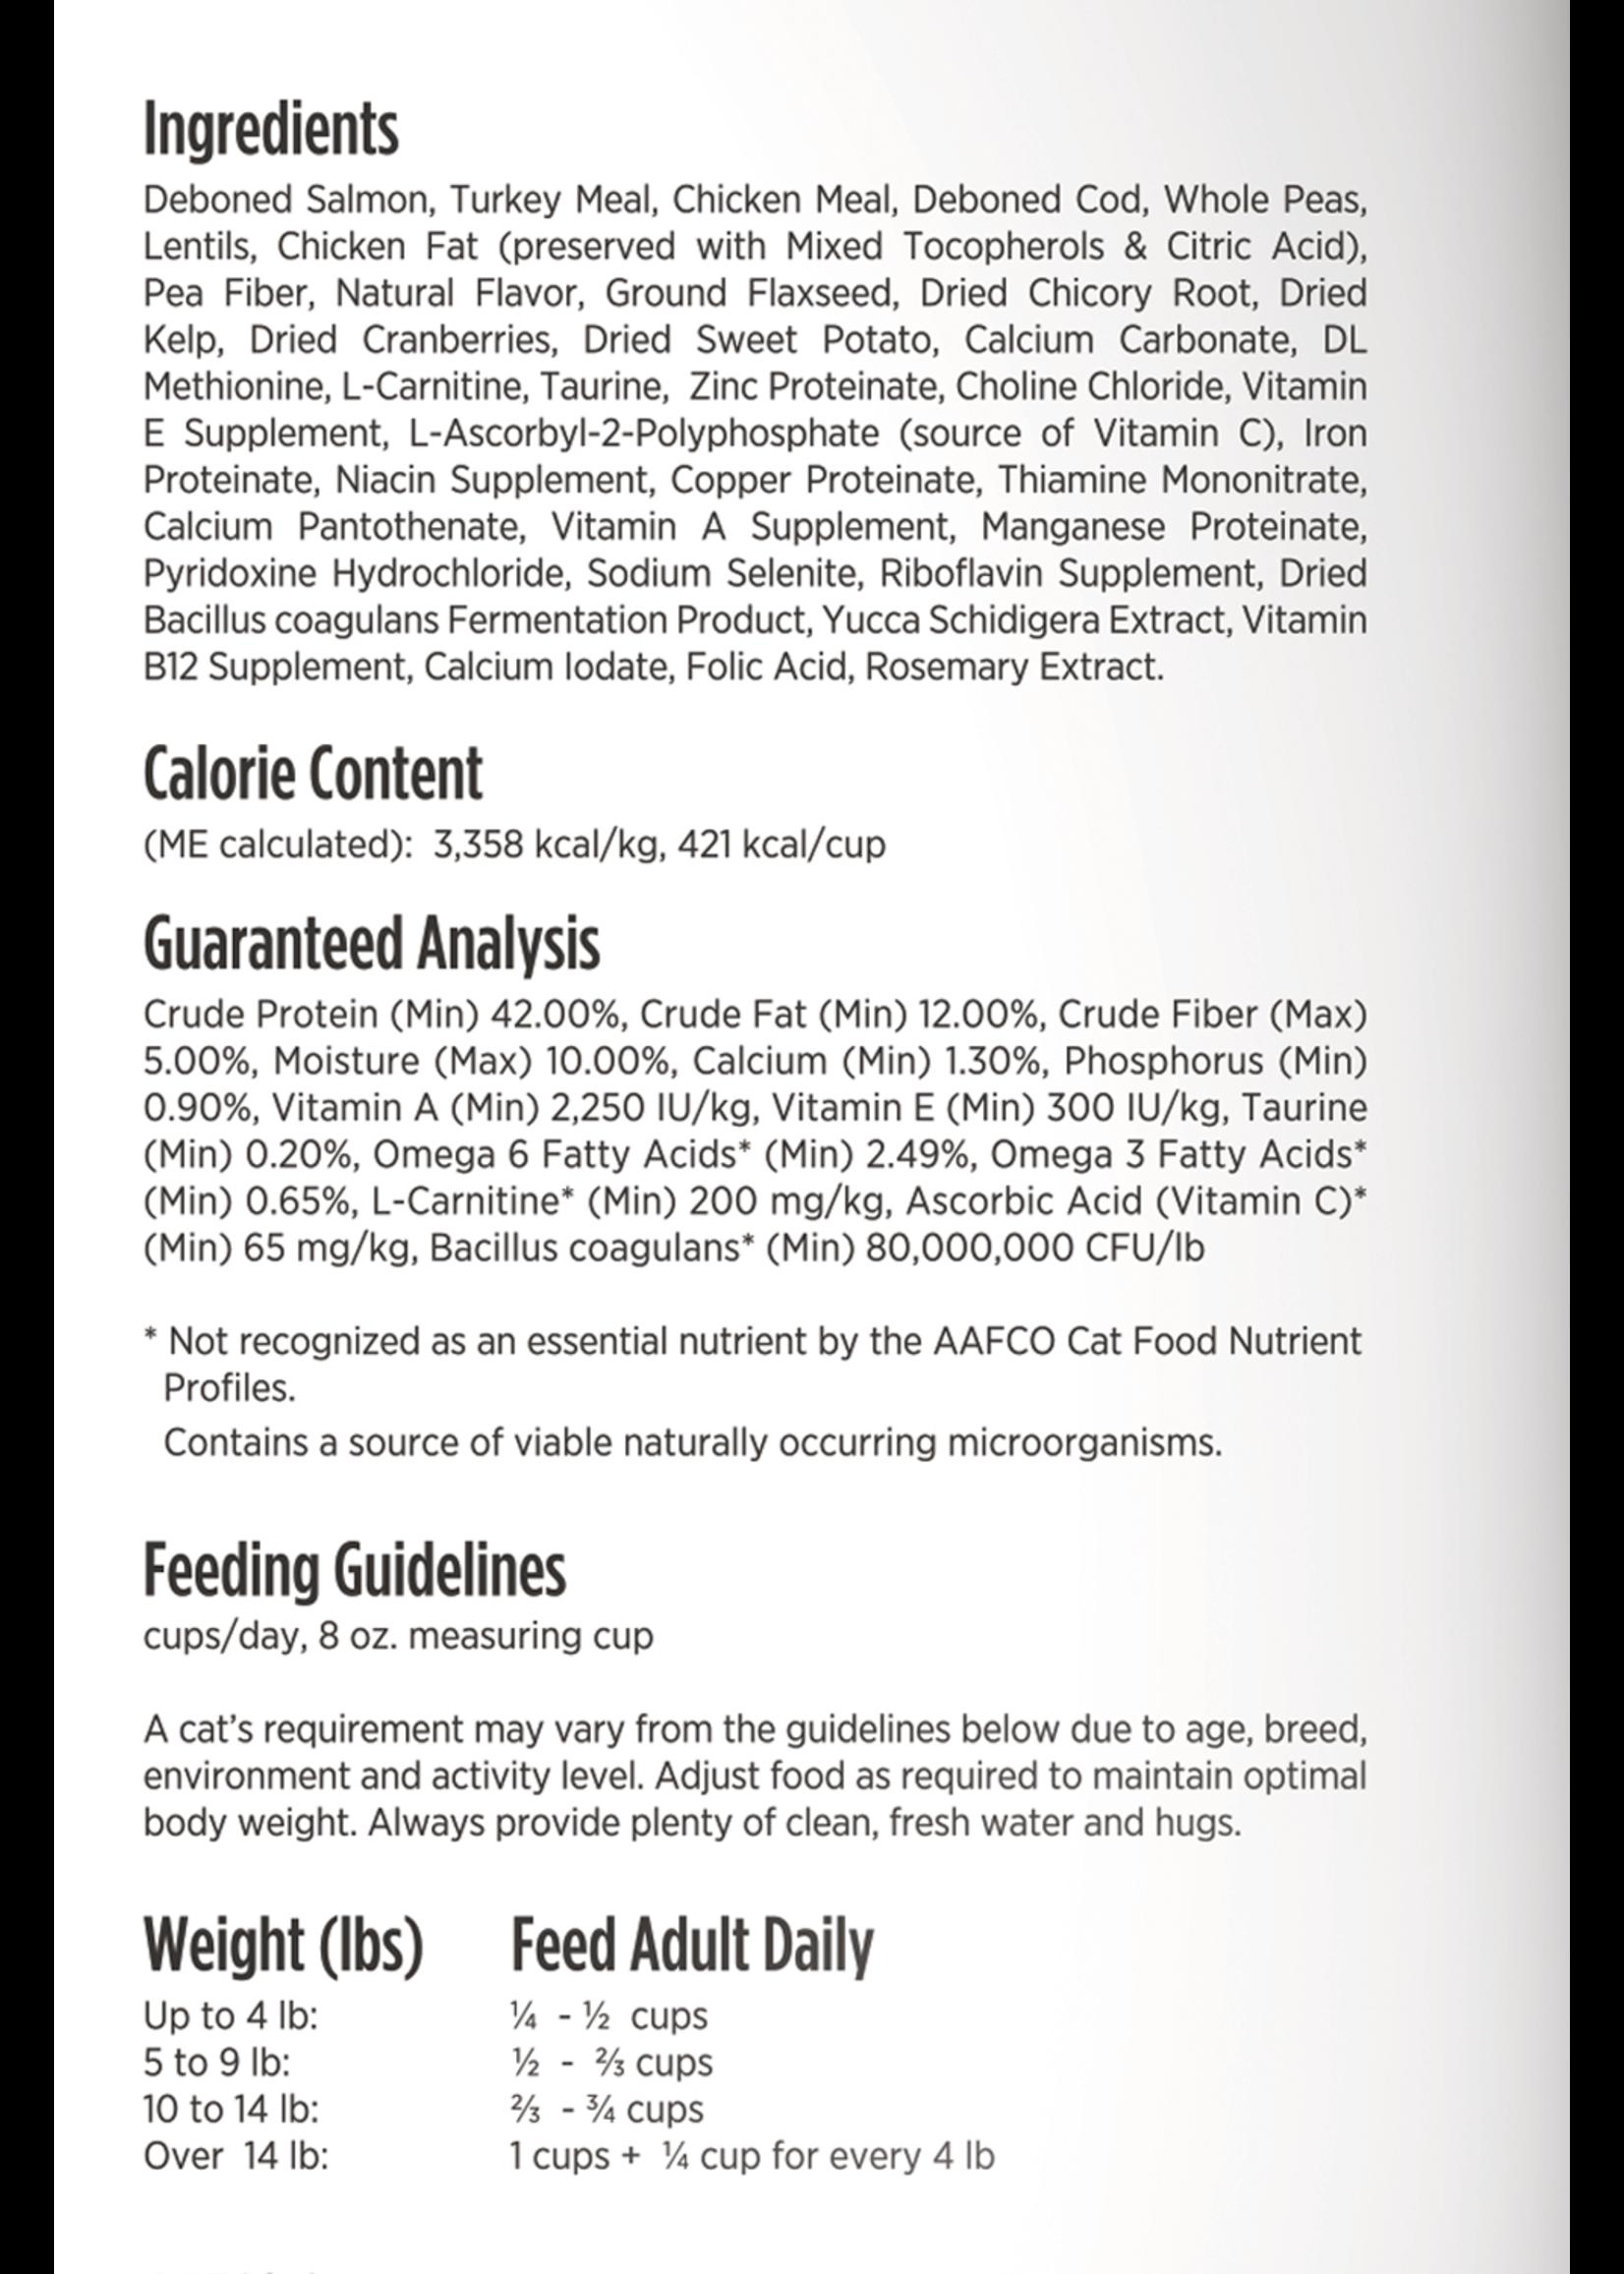 Nulo Nulo FreeStyle Grain Free Adult Trim Cat Food Salmon & Lentils, 5lb Bag